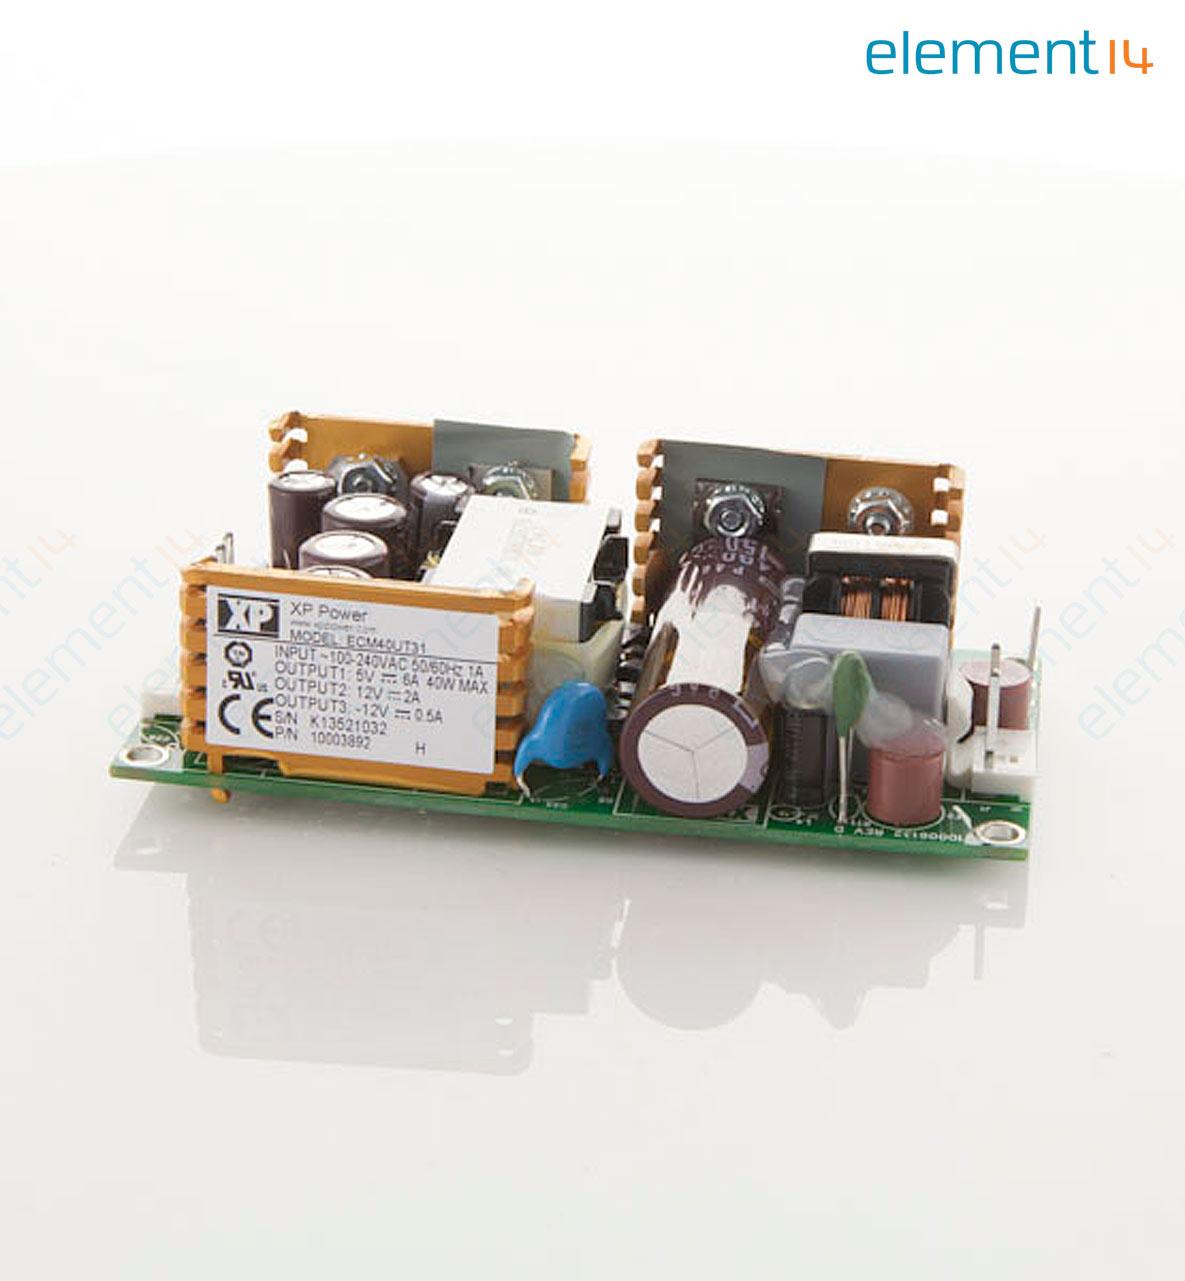 ECM40UT31 XP POWER, AC/DC Open Frame Power Supply (PSU), ITE ...